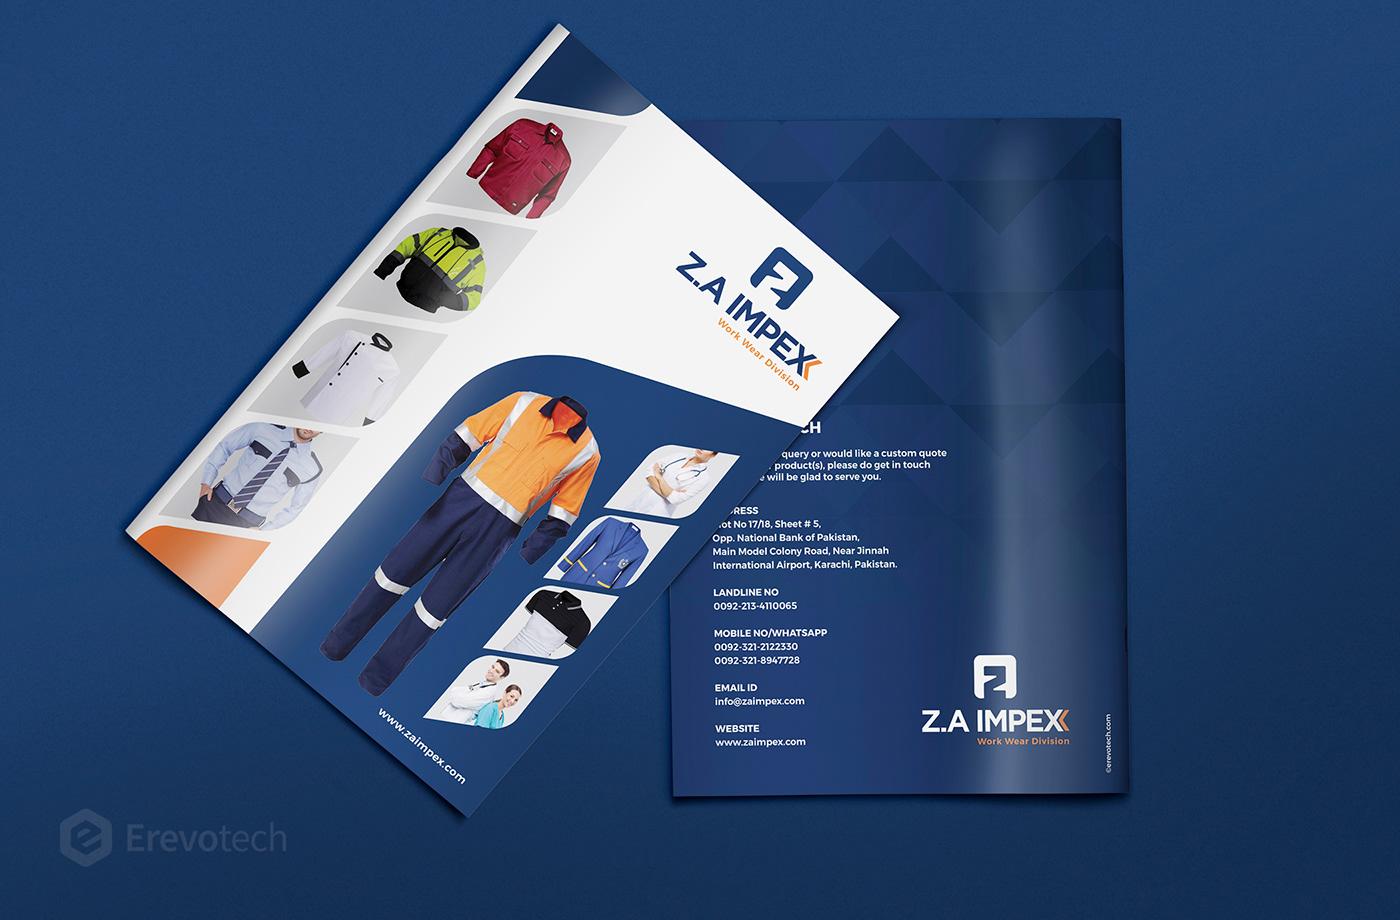 uniform and workwear catalogue design